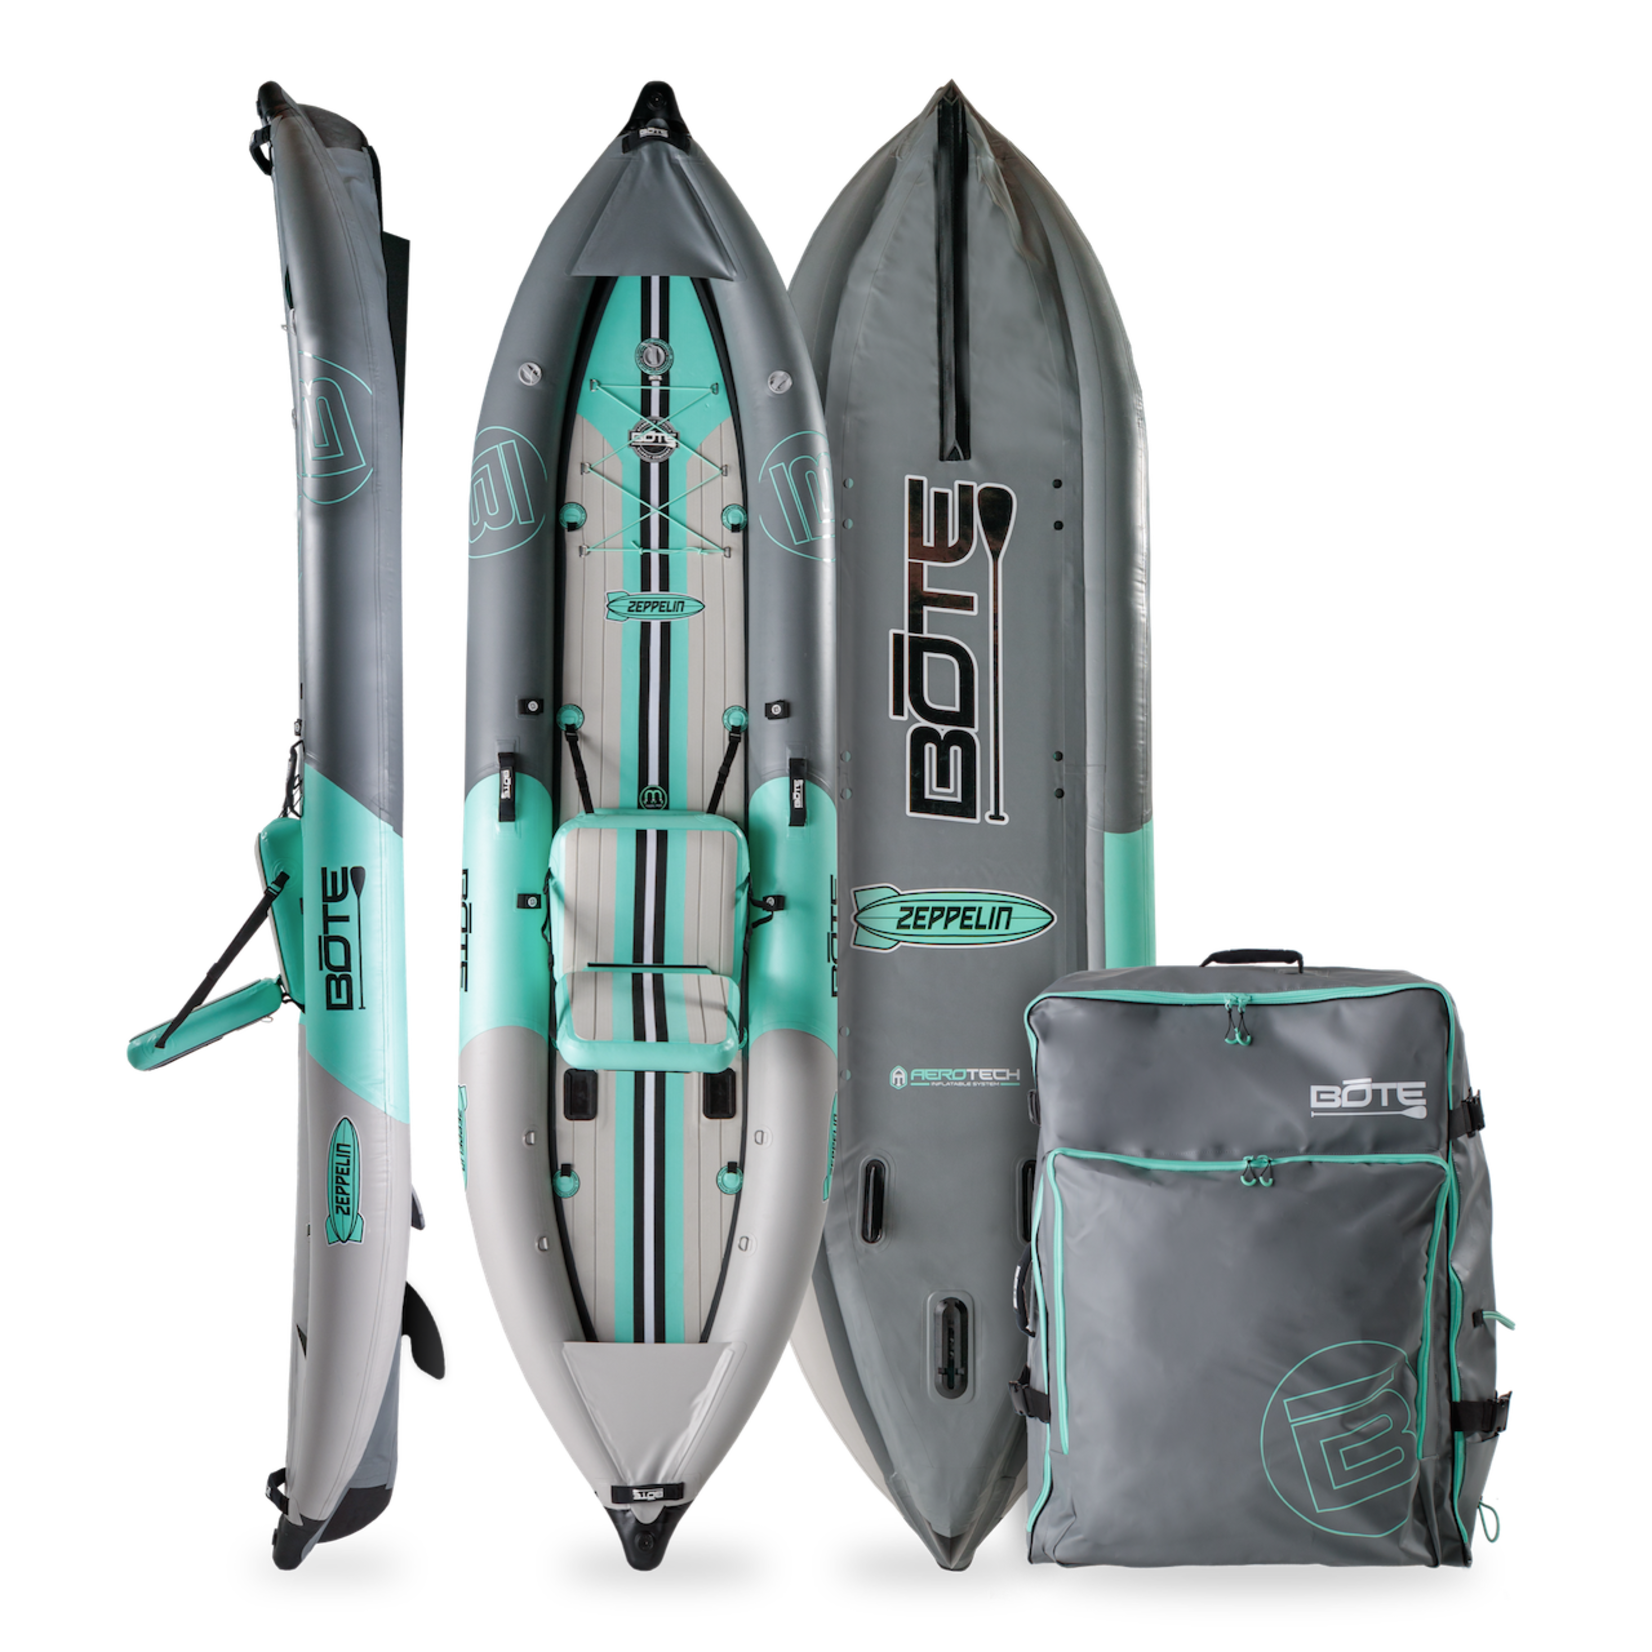 Bote Bote Zeppelin Aero 12′6″ Inflatable Kayak